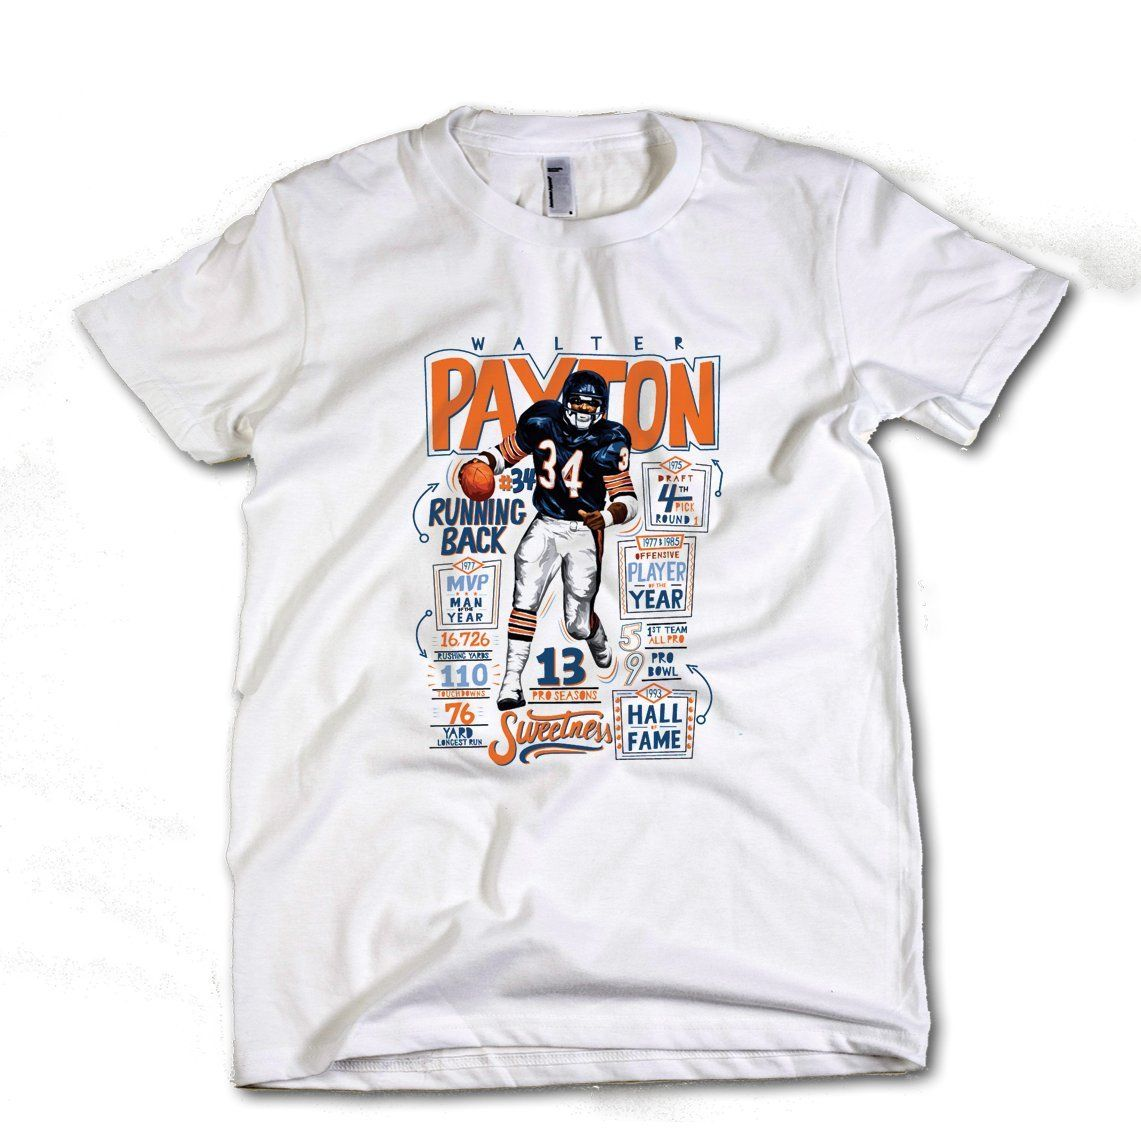 Walter Payton Chicago Youth T-Shirt Payton 34 14-16 White.